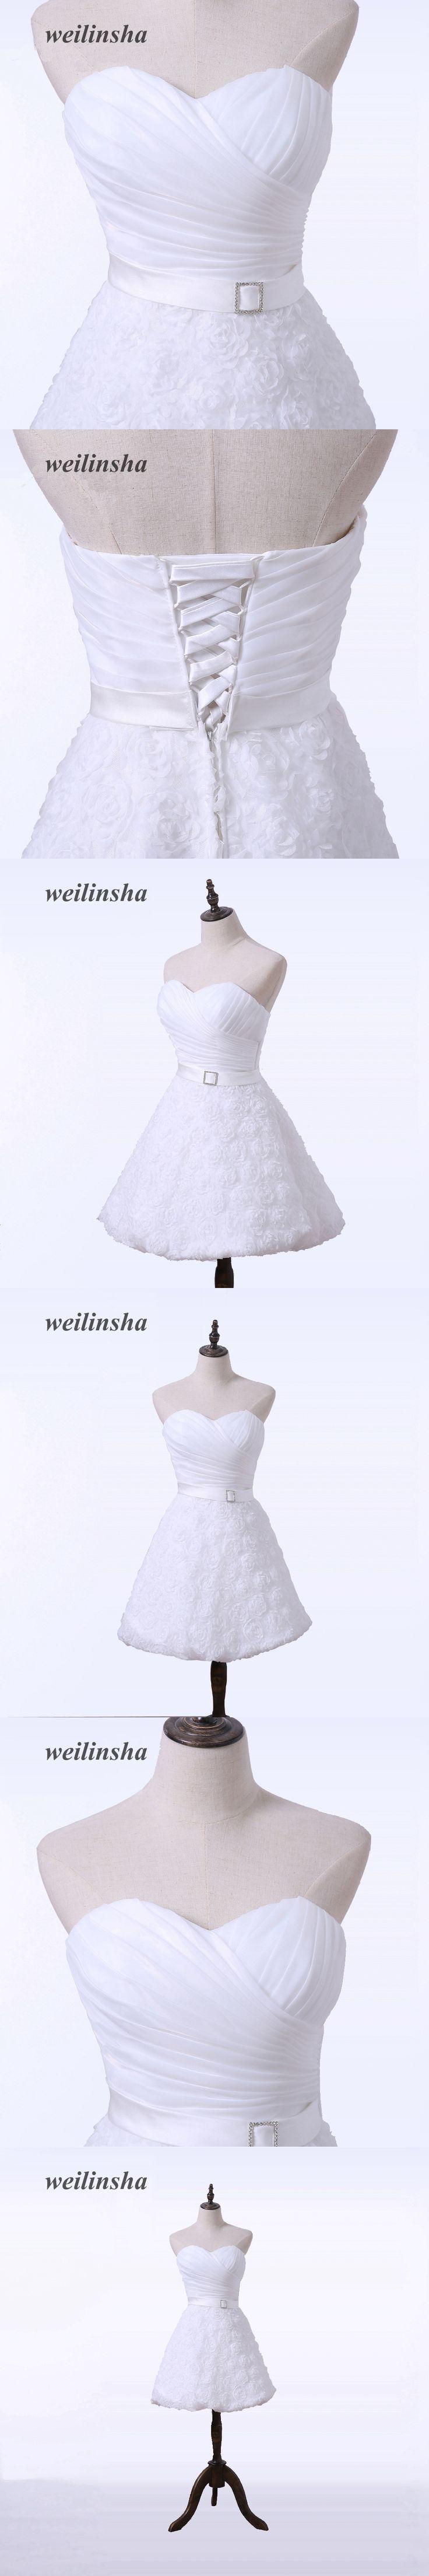 weilinsha A-Line Lace Short Wedding Reception Dresses Cheap Knee Length Mini Wedding Dresses